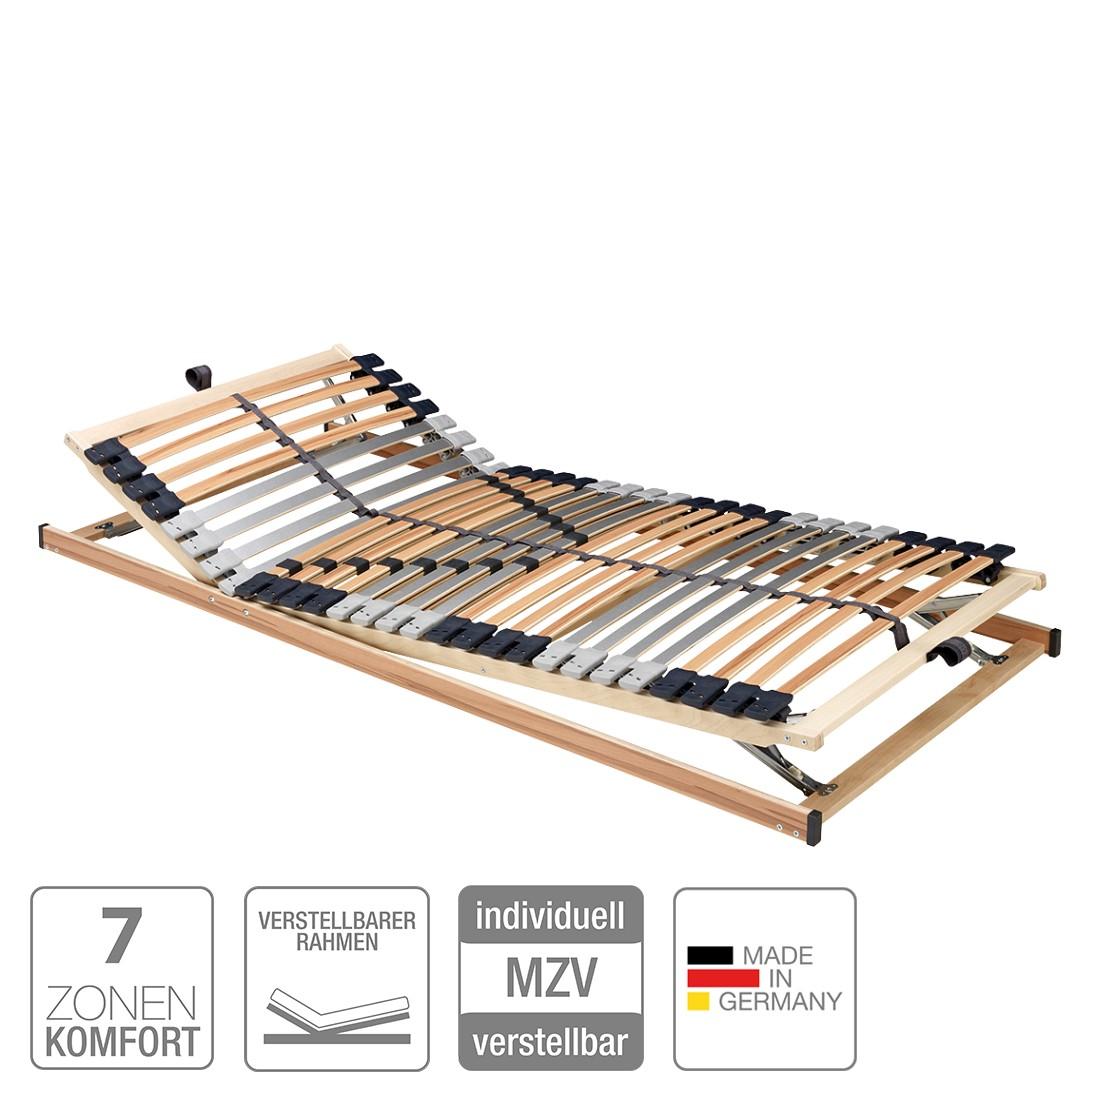 Lattenrost Prima (7 Zonen) - verstellbar - 90 x 200cm